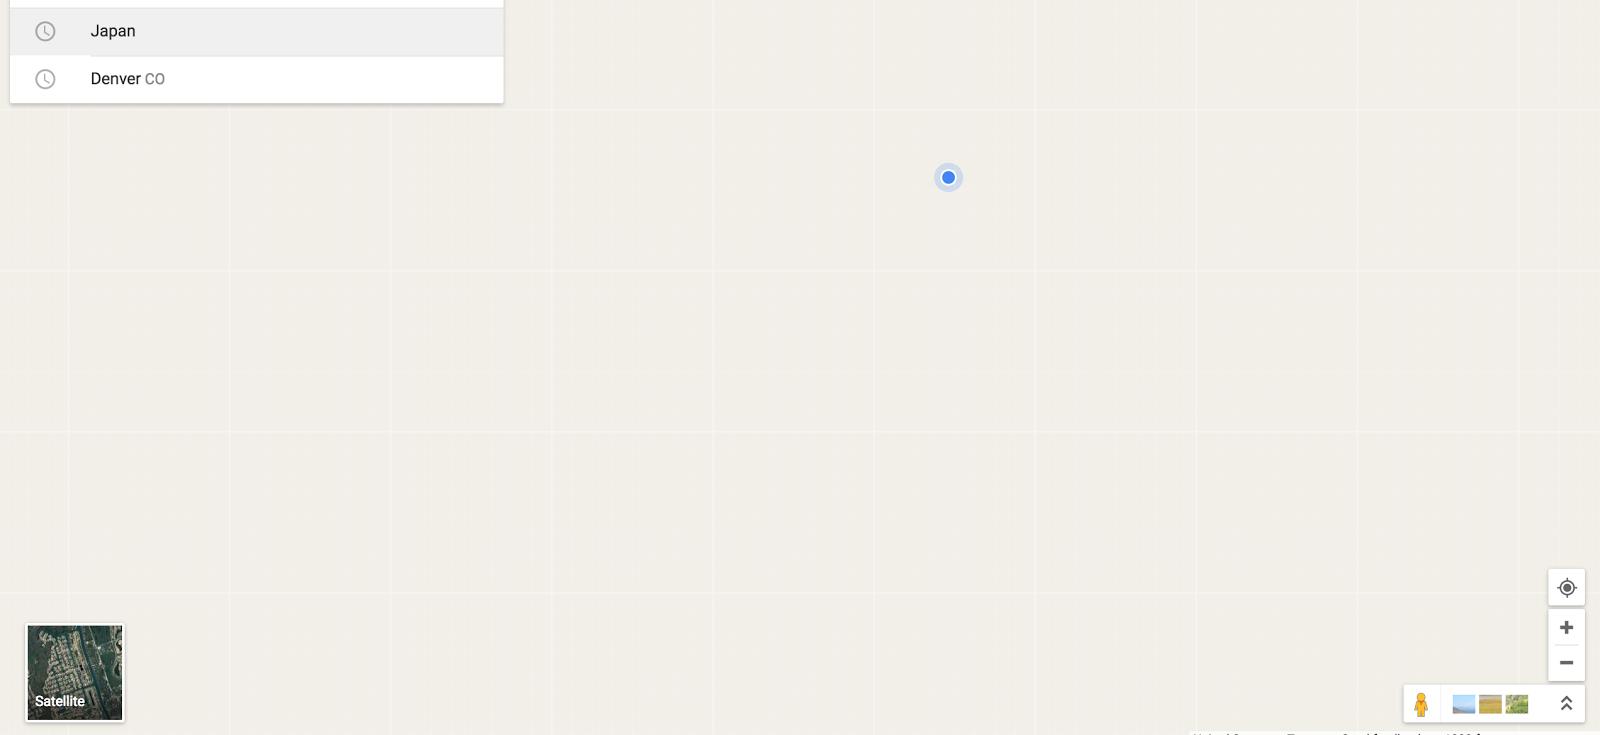 Google Maps on Chrome went blank - Google Maps Help on